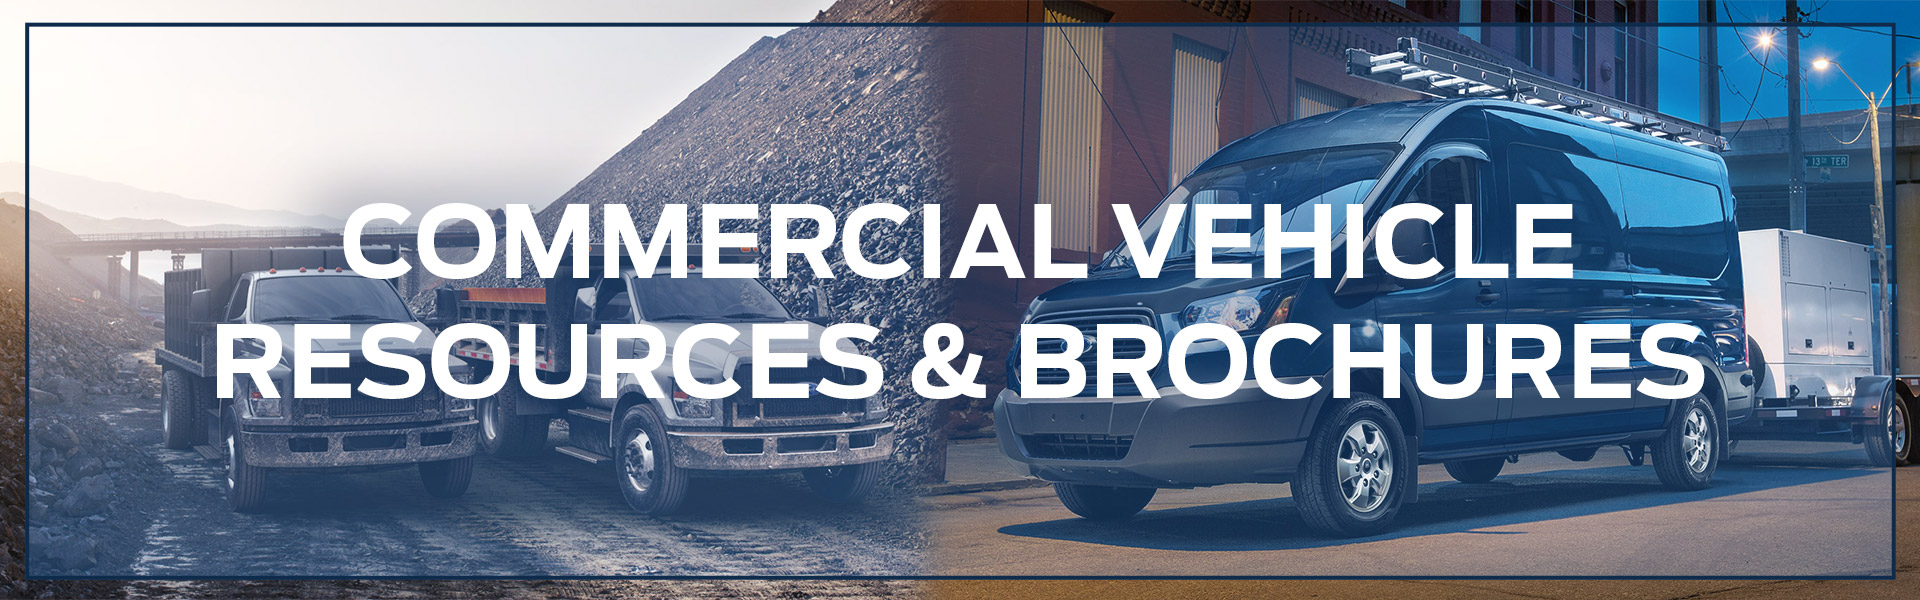 Fleet Commercial Vehicles Washington Vancouver Portland Oregon